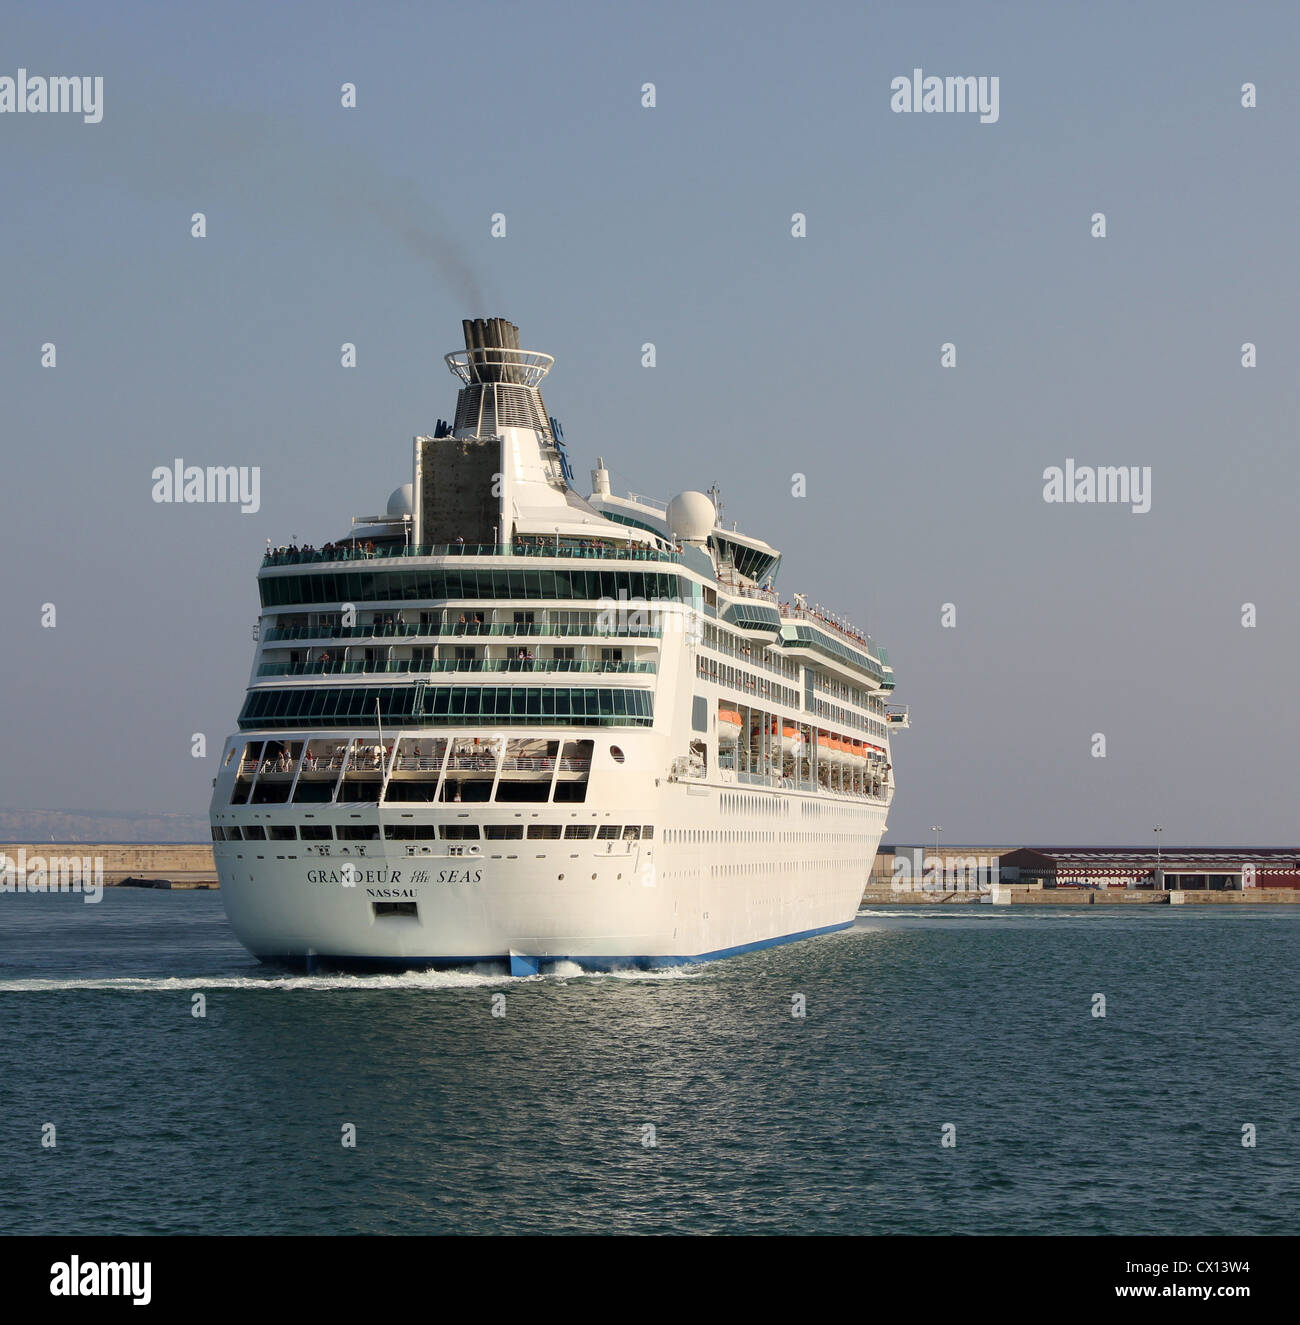 Royal Caribbean International Cruise Line 'Grandeur of the Seas' performing a pirouette during her departure - Stock Image